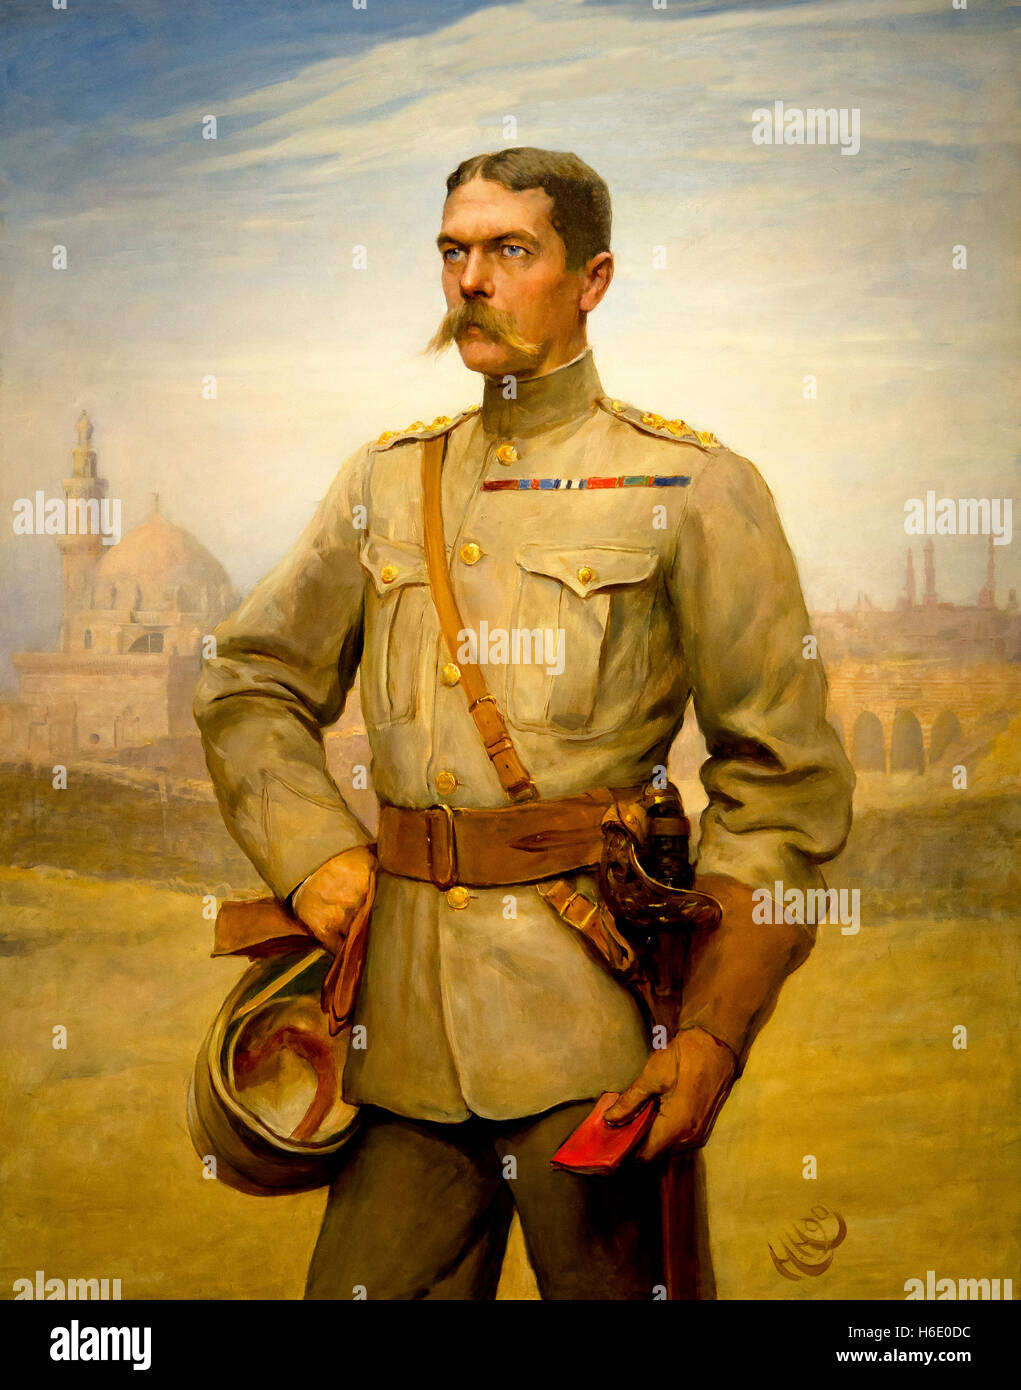 Horatio Herbert Kitchener, Secretary of State for War,by Sir Hubert von Herkomer and Frederick Goodall, 1890, - Stock Image